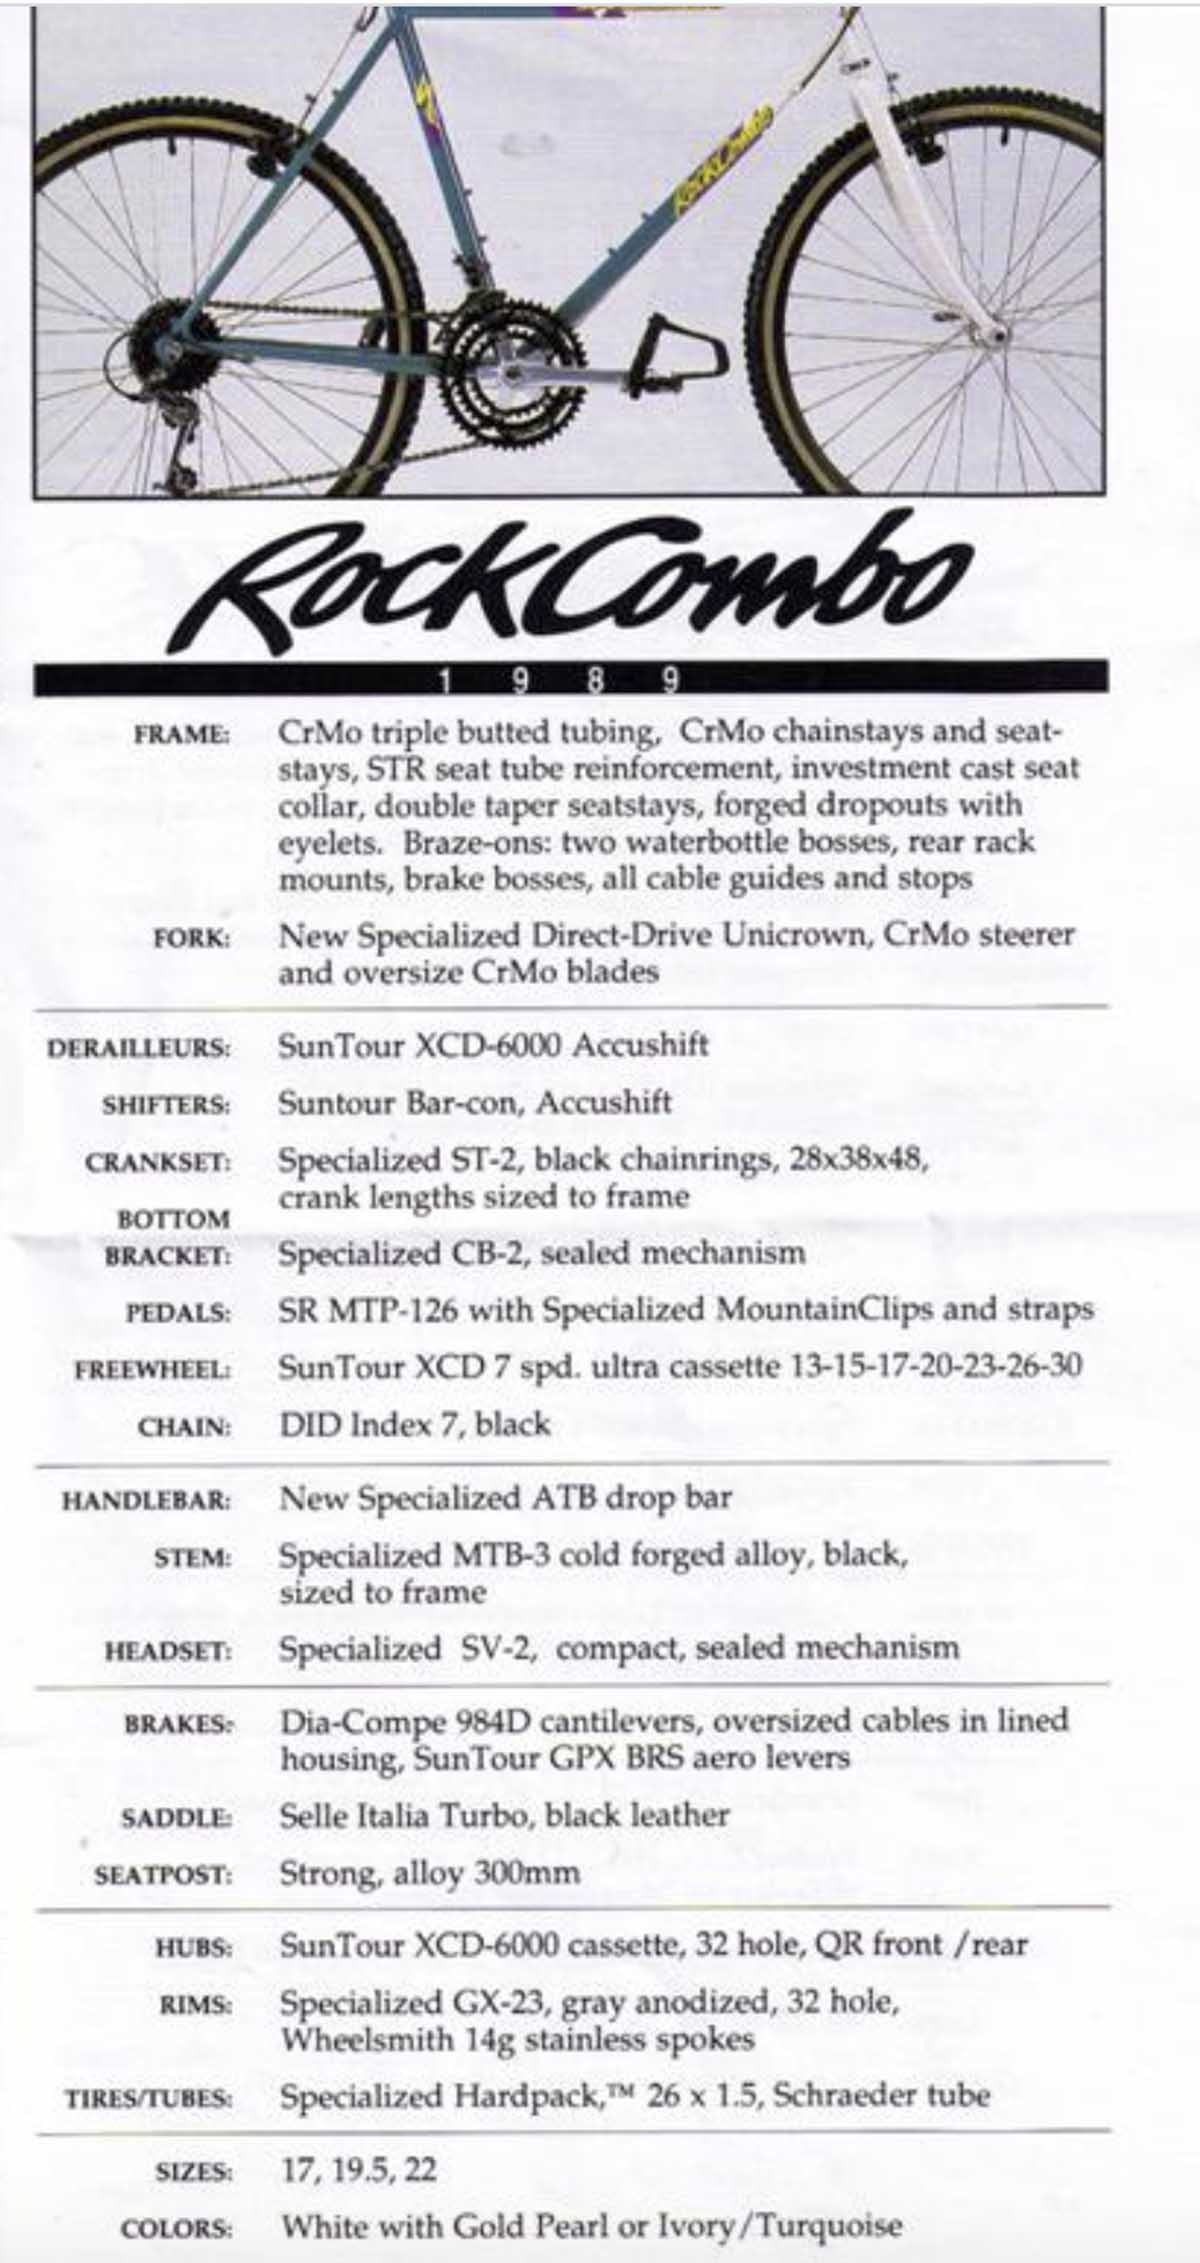 Specialized 1989 RockCombo ad